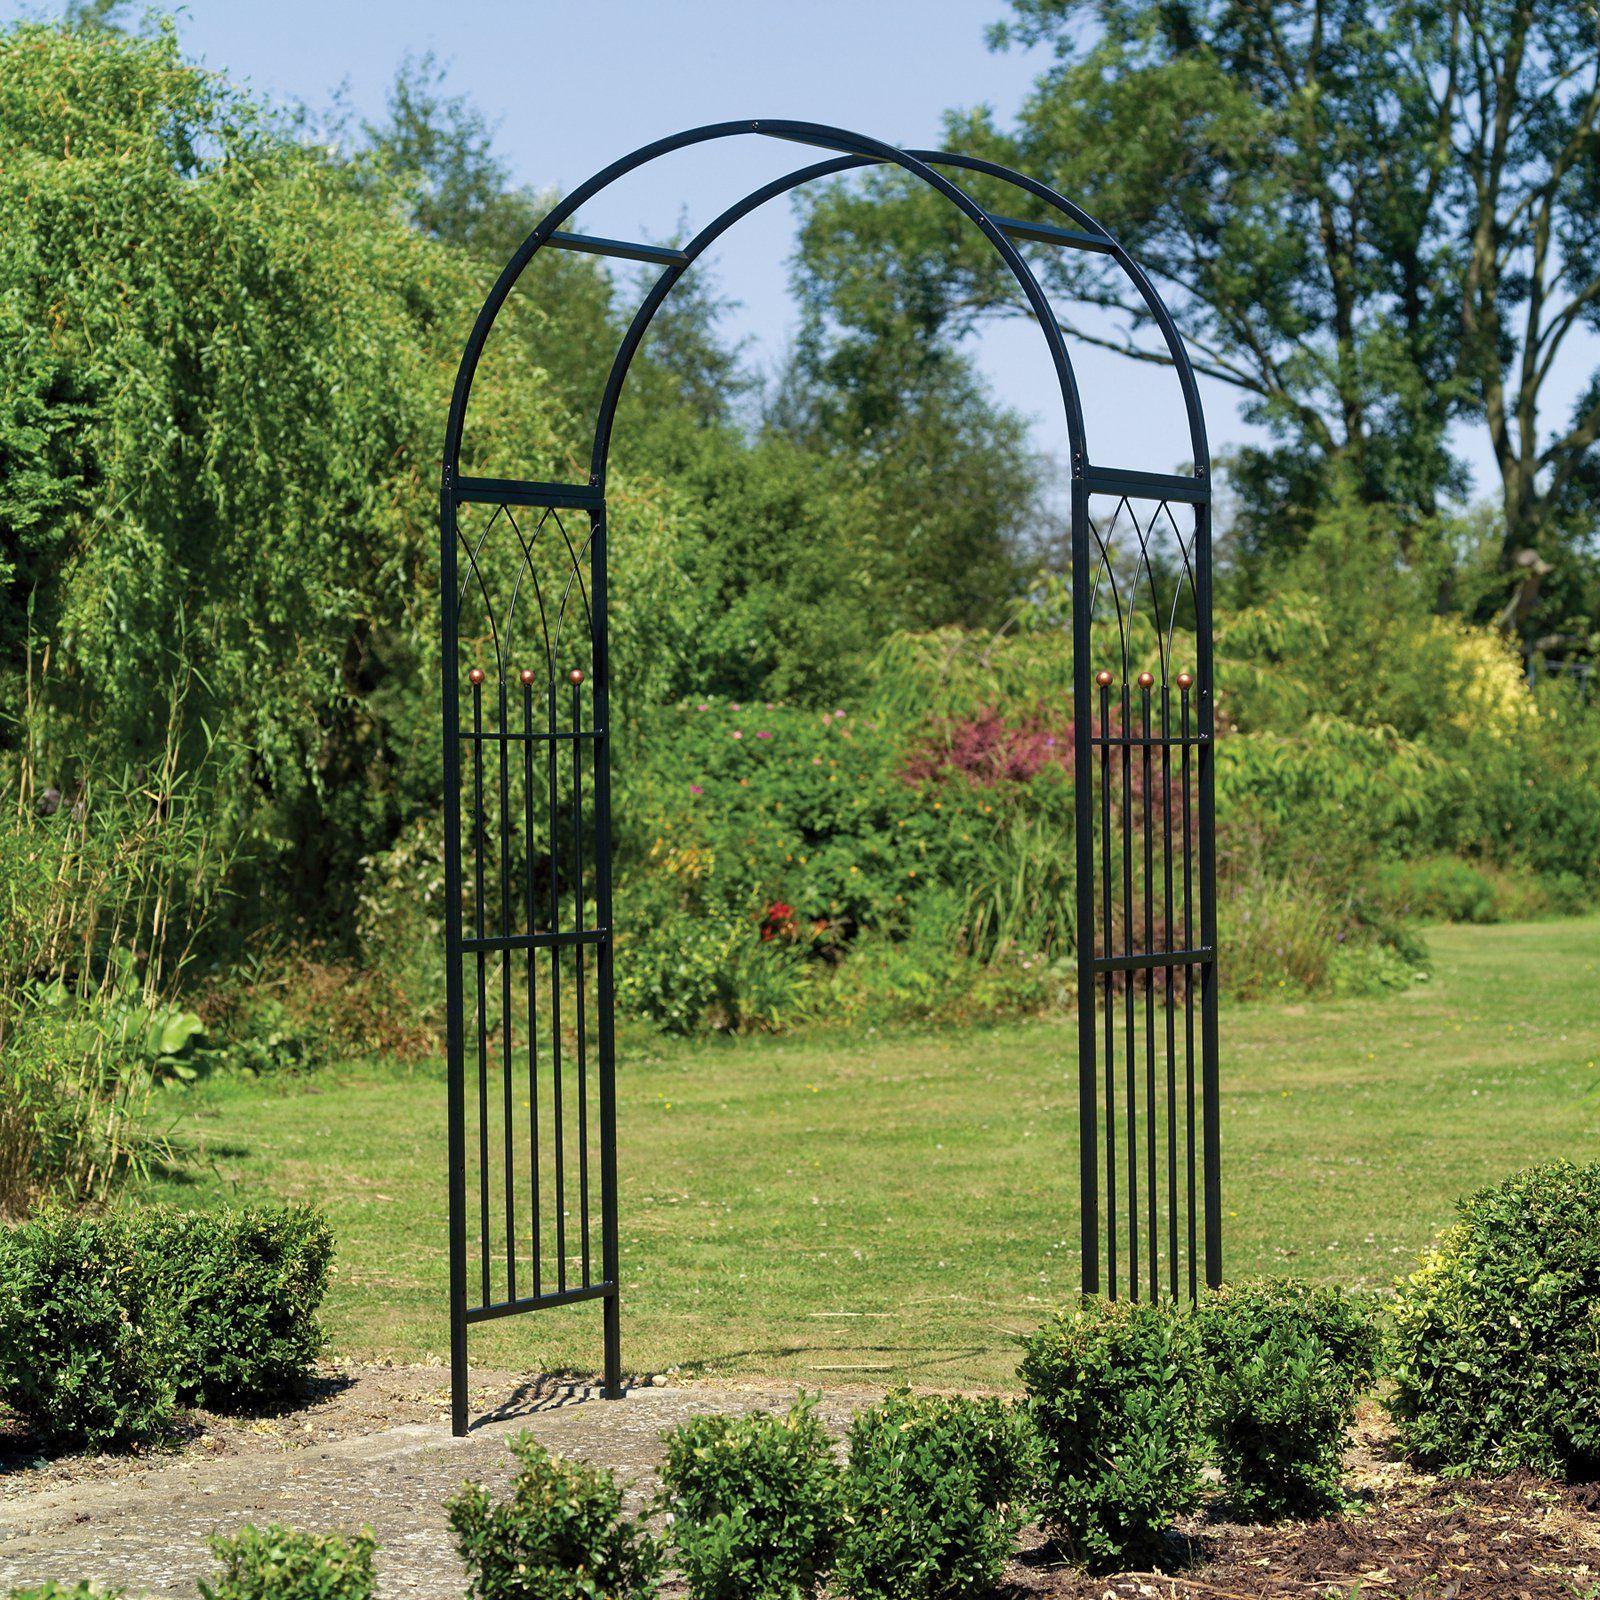 Gardman Westminster 6 5 Ft Metal Arch Arbor Garden Archway